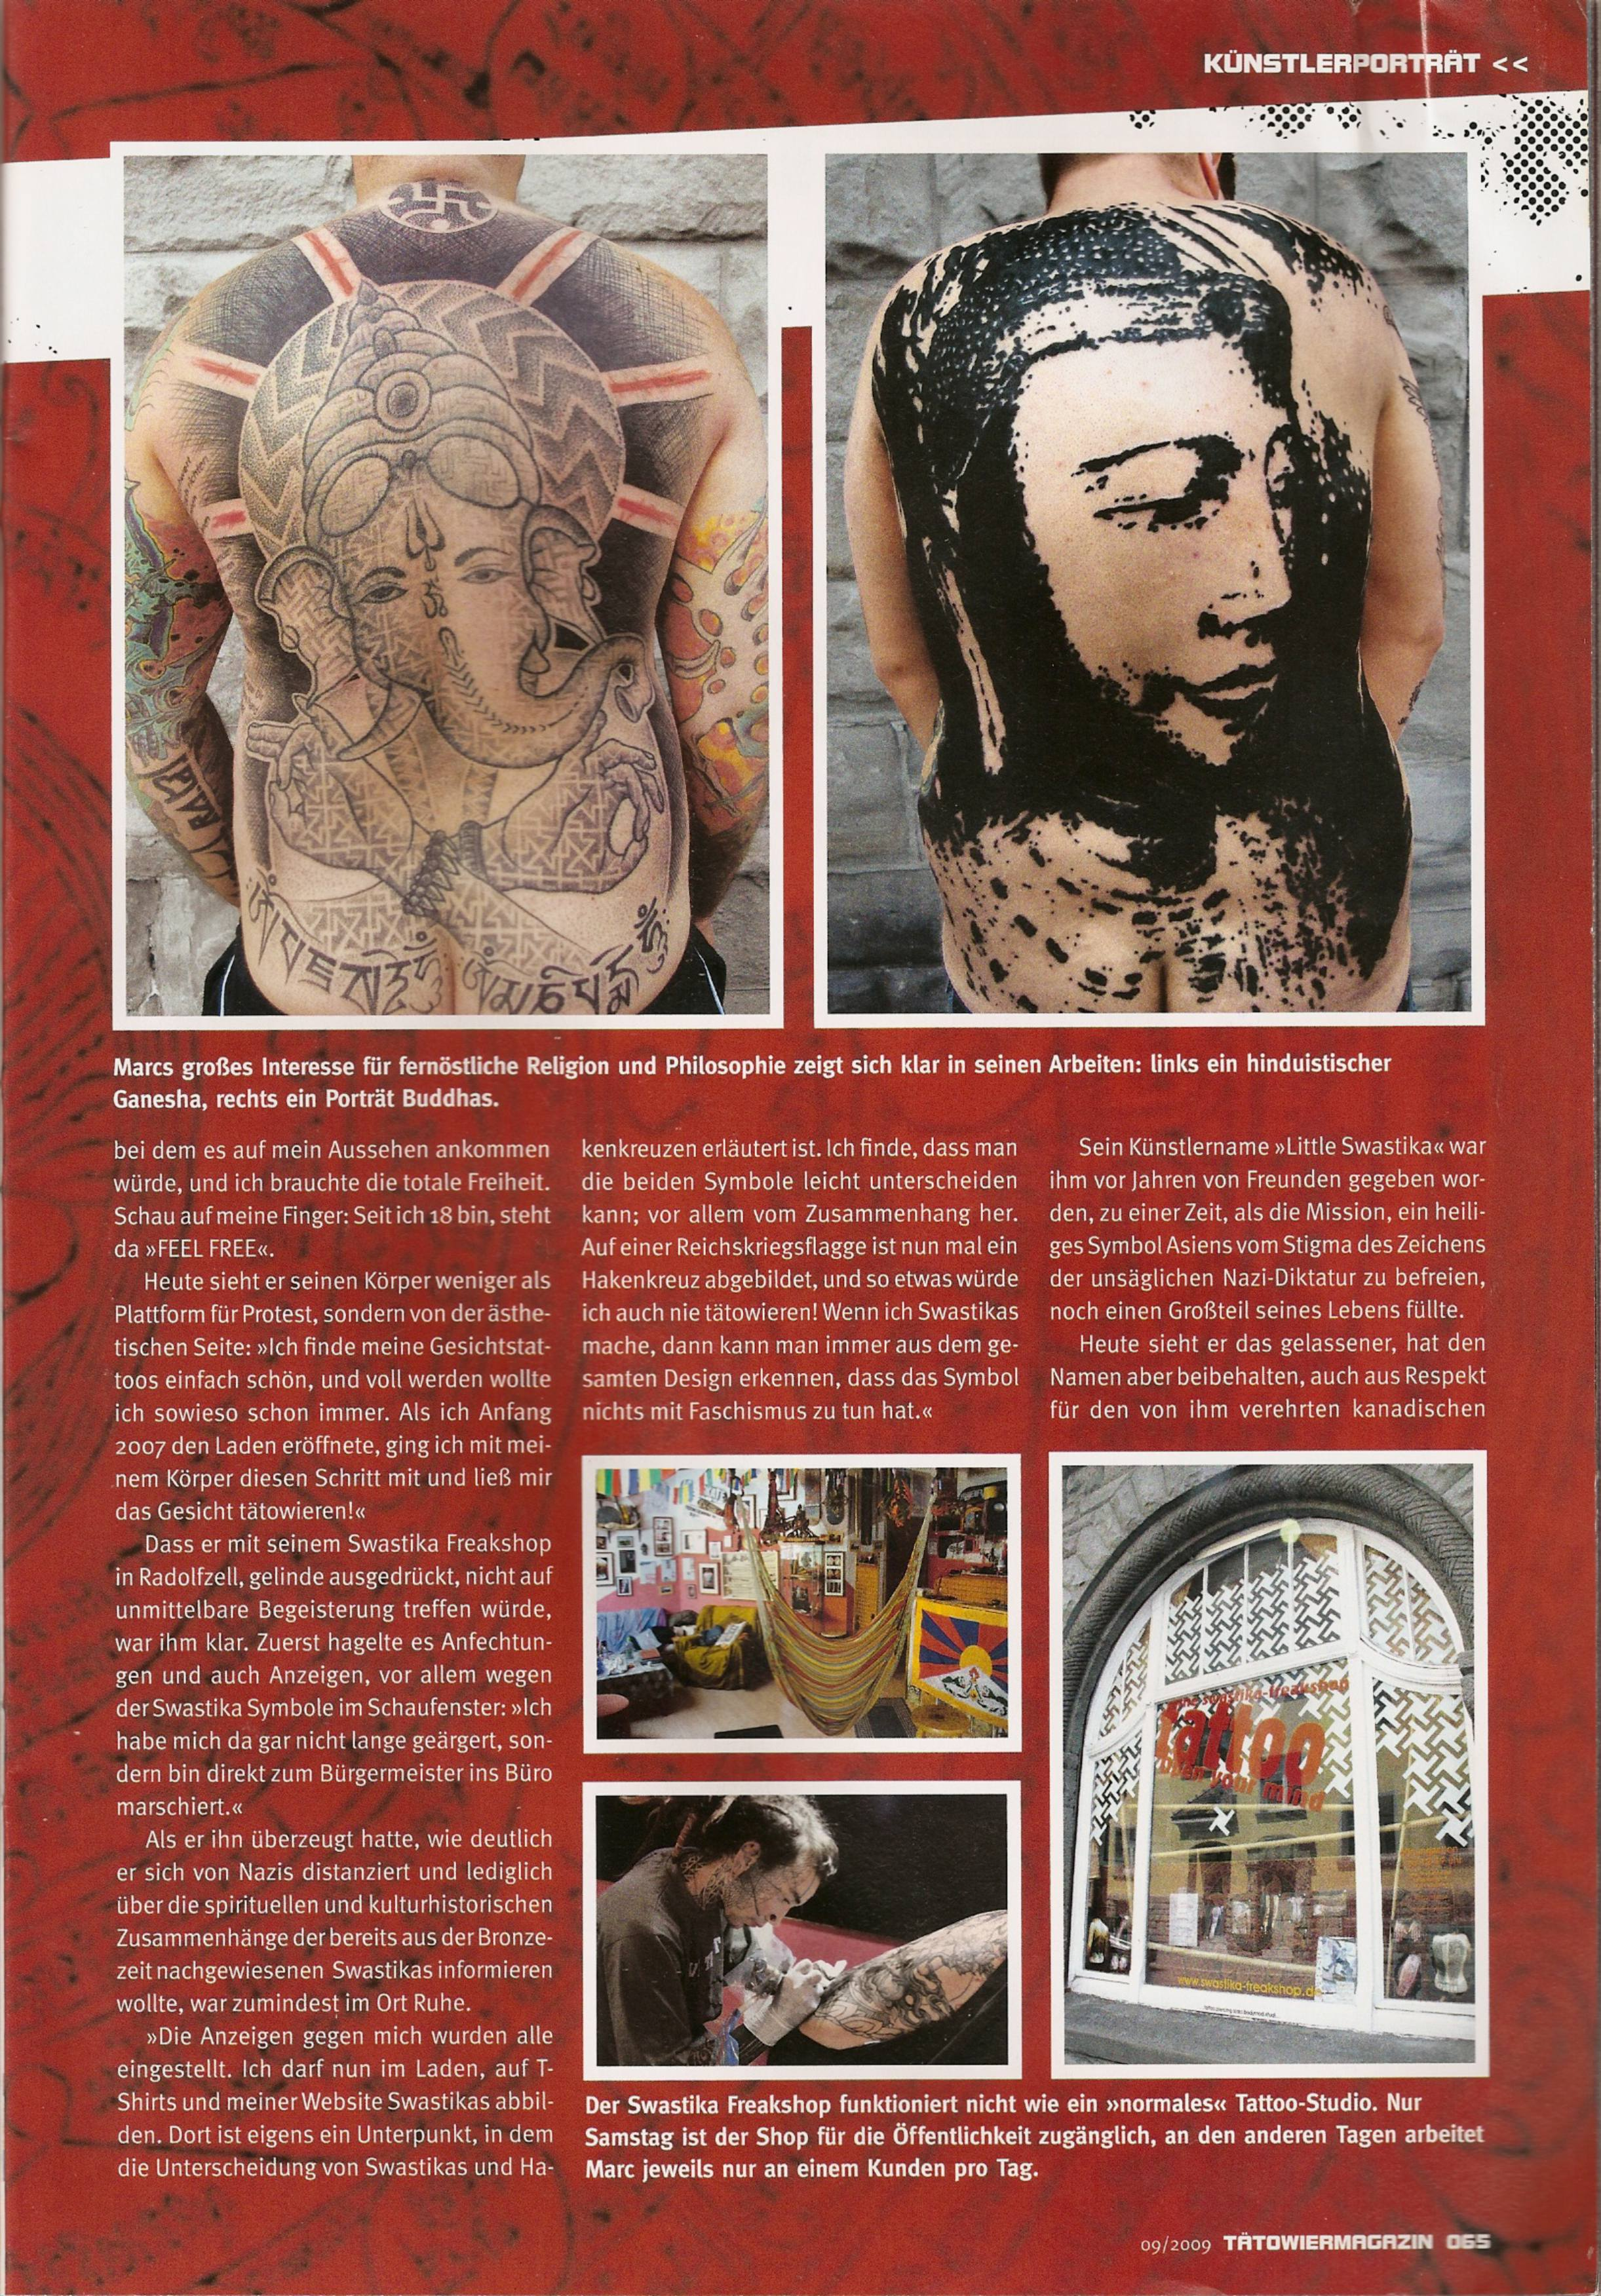 taetowiermagazin-7